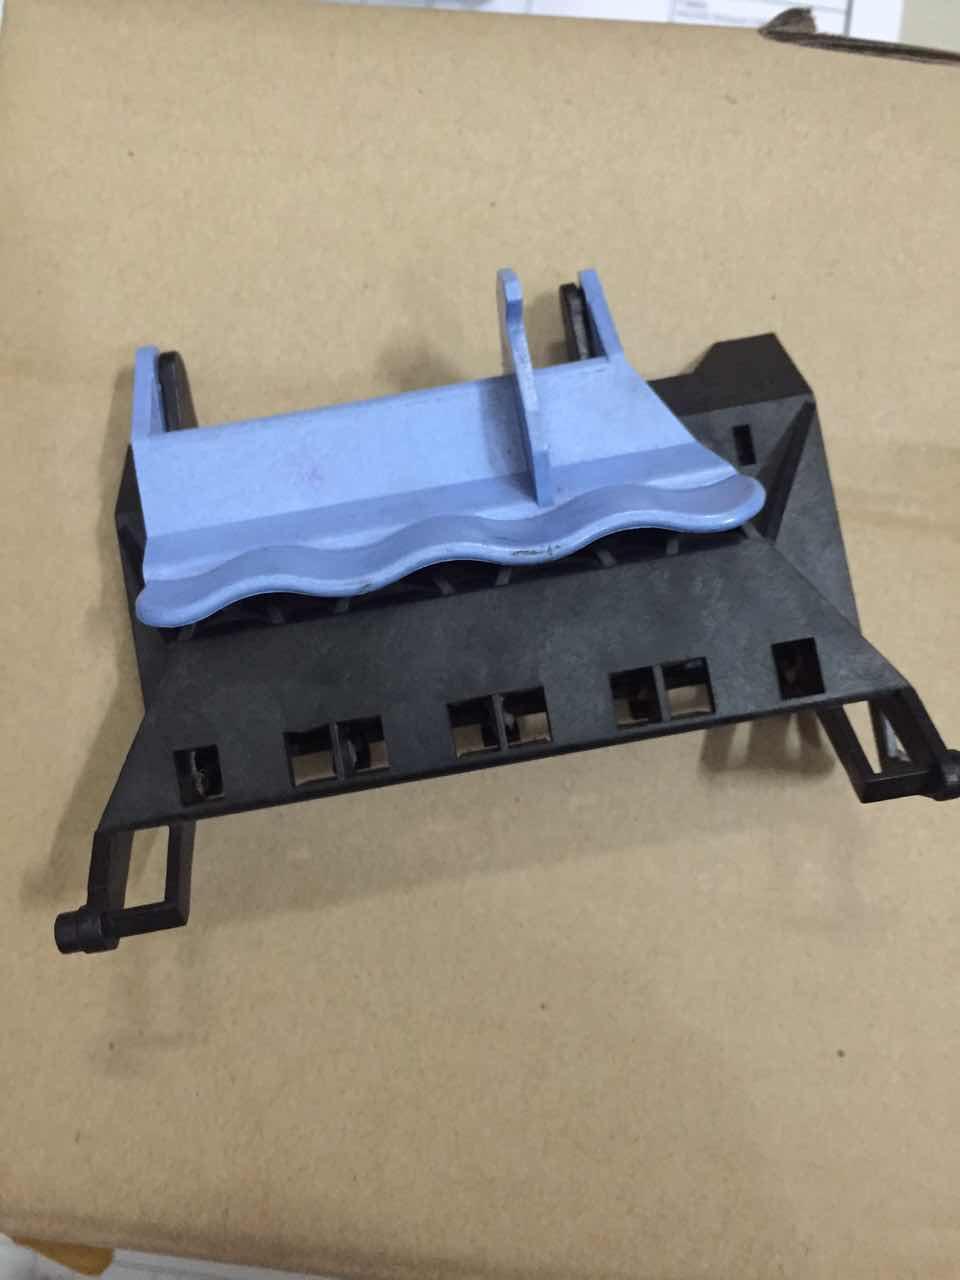 Carriage-Cover(Black + Blue) for HP DesignJet 500 510 800 C7769 C7779 PRINTER